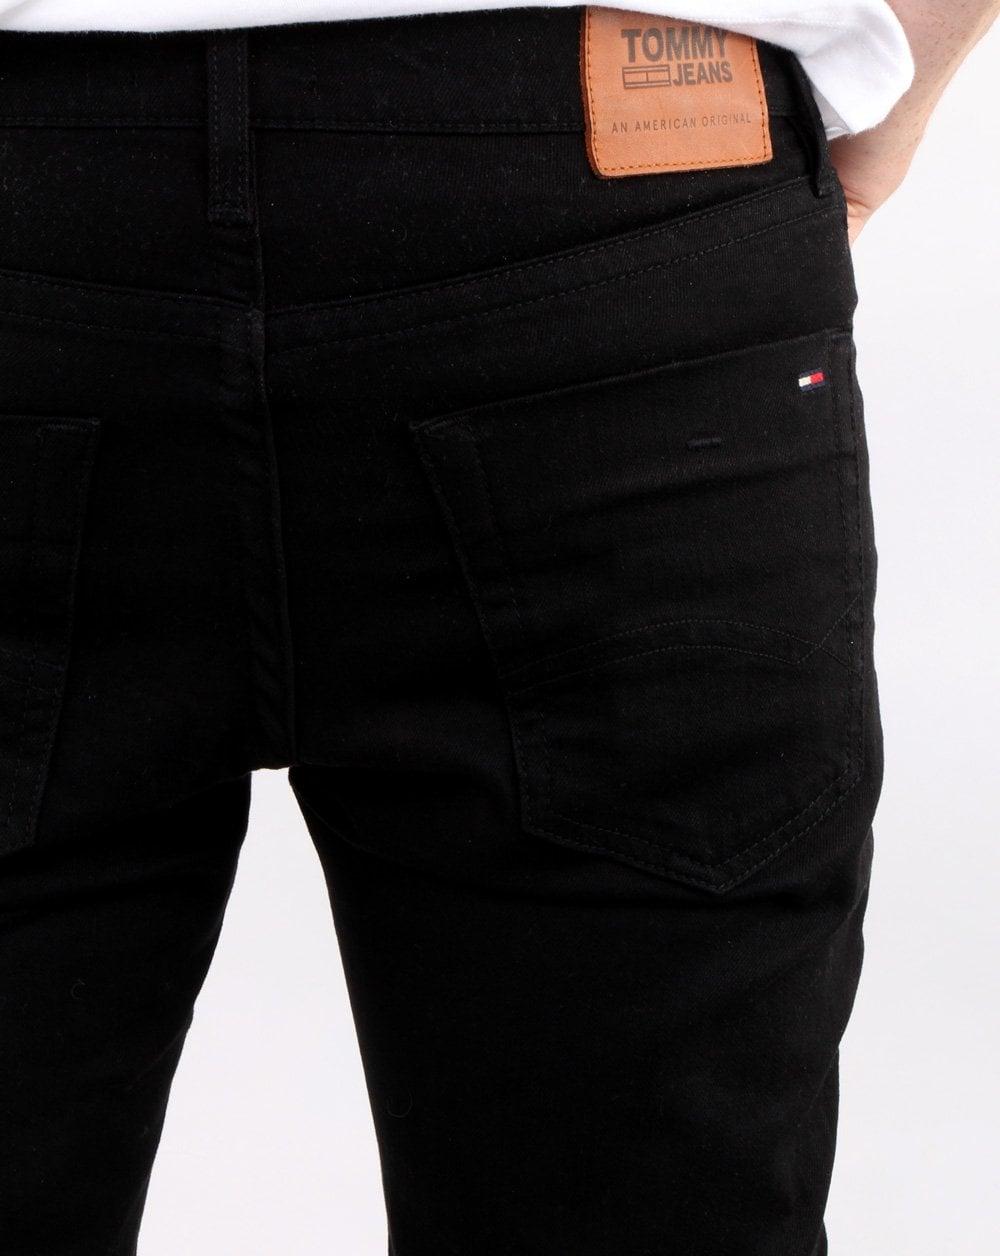 d70cf054 Tommy Hilfiger Scanton Slim Fit Jeans Black | 80s casual classics